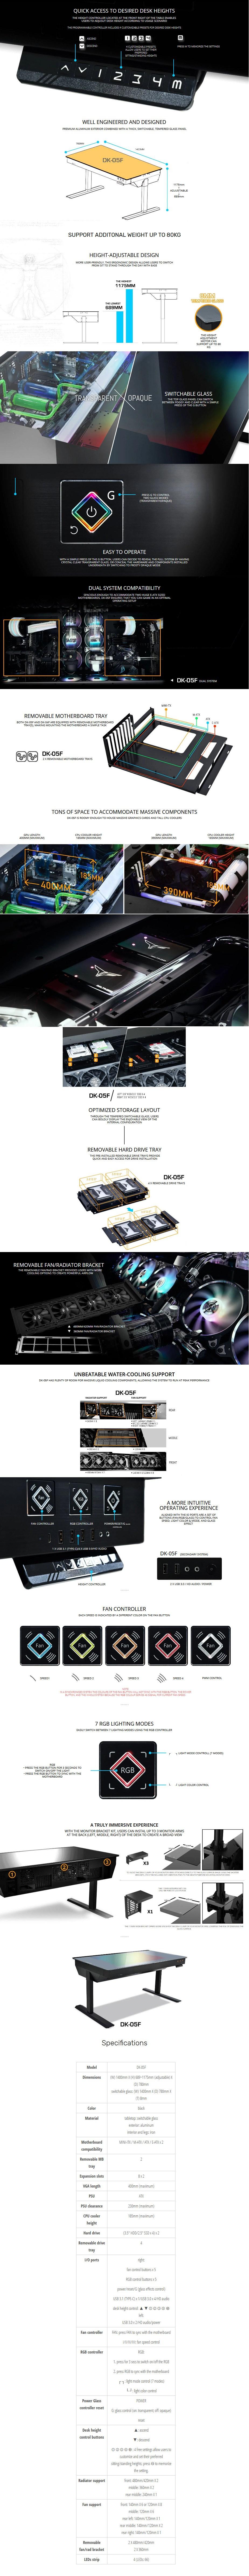 Lian-Li DK-05F Aluminium Dual System Desk Case - Black - Overview 1